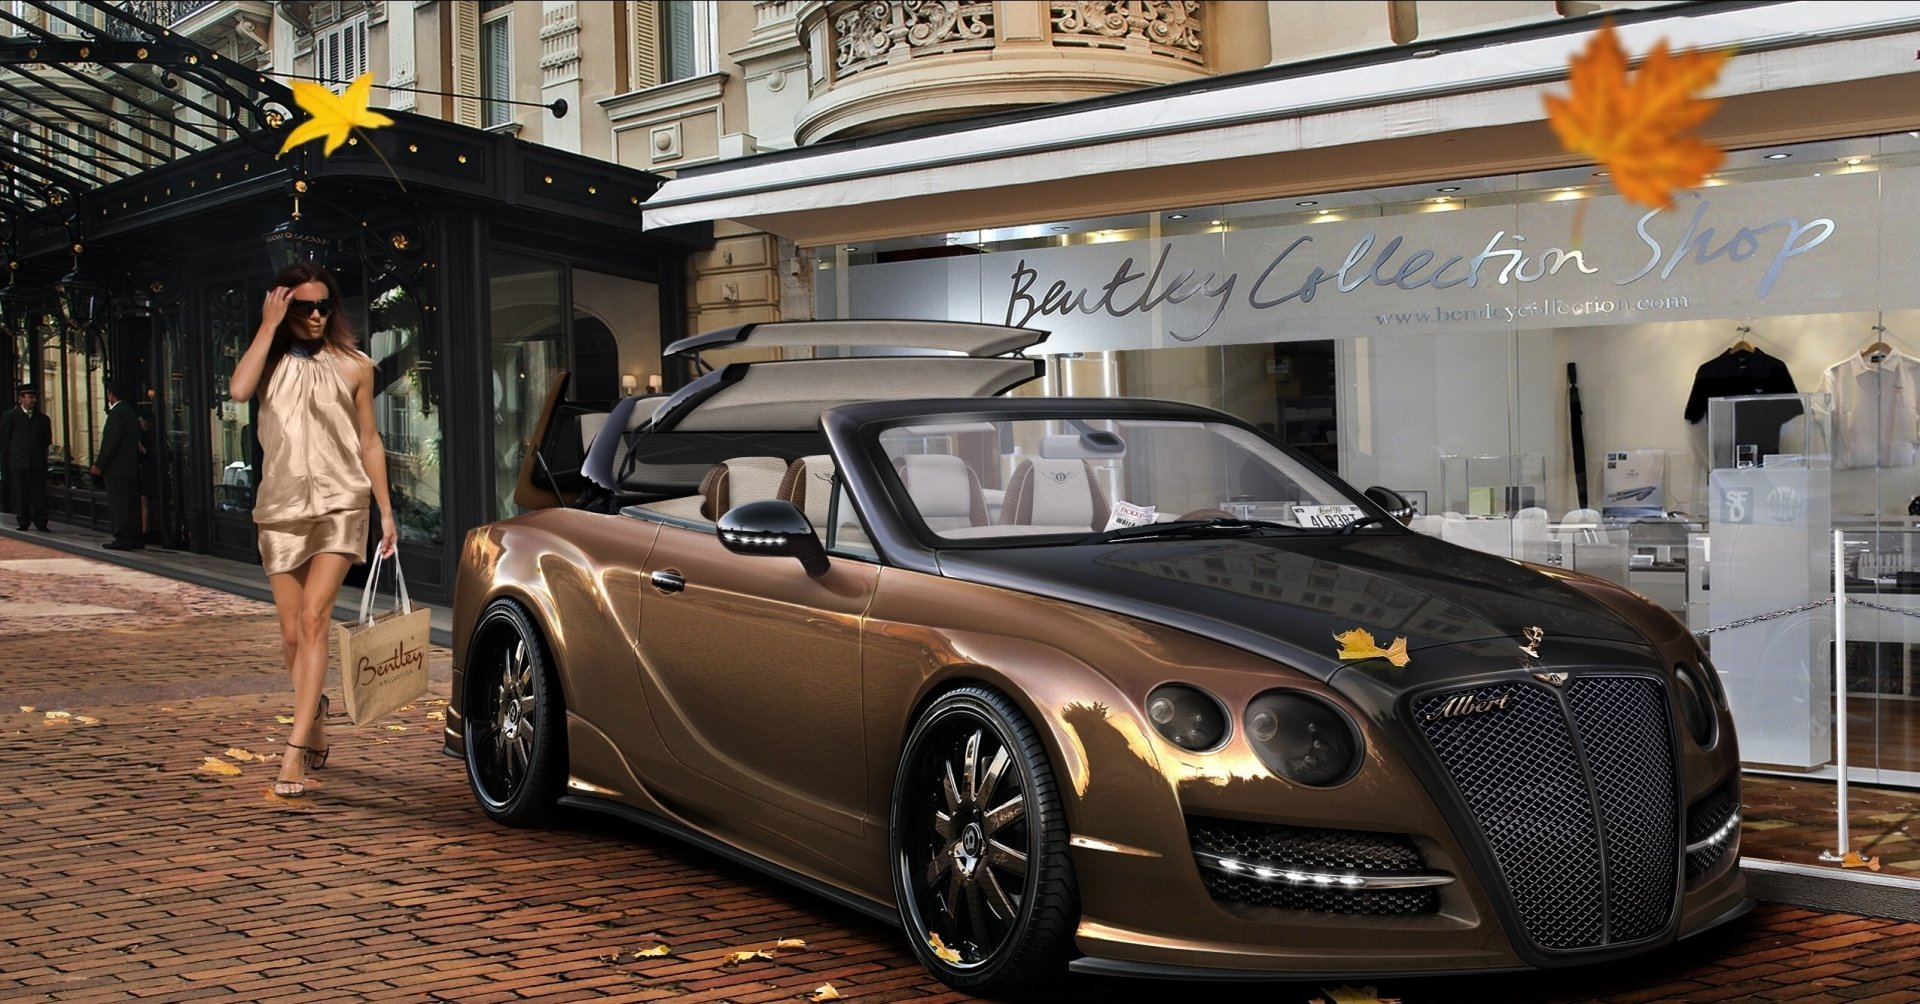 Mustang Wallpaper Iphone X Bentley Continental Gt Convertible Full Hd Wallpaper And